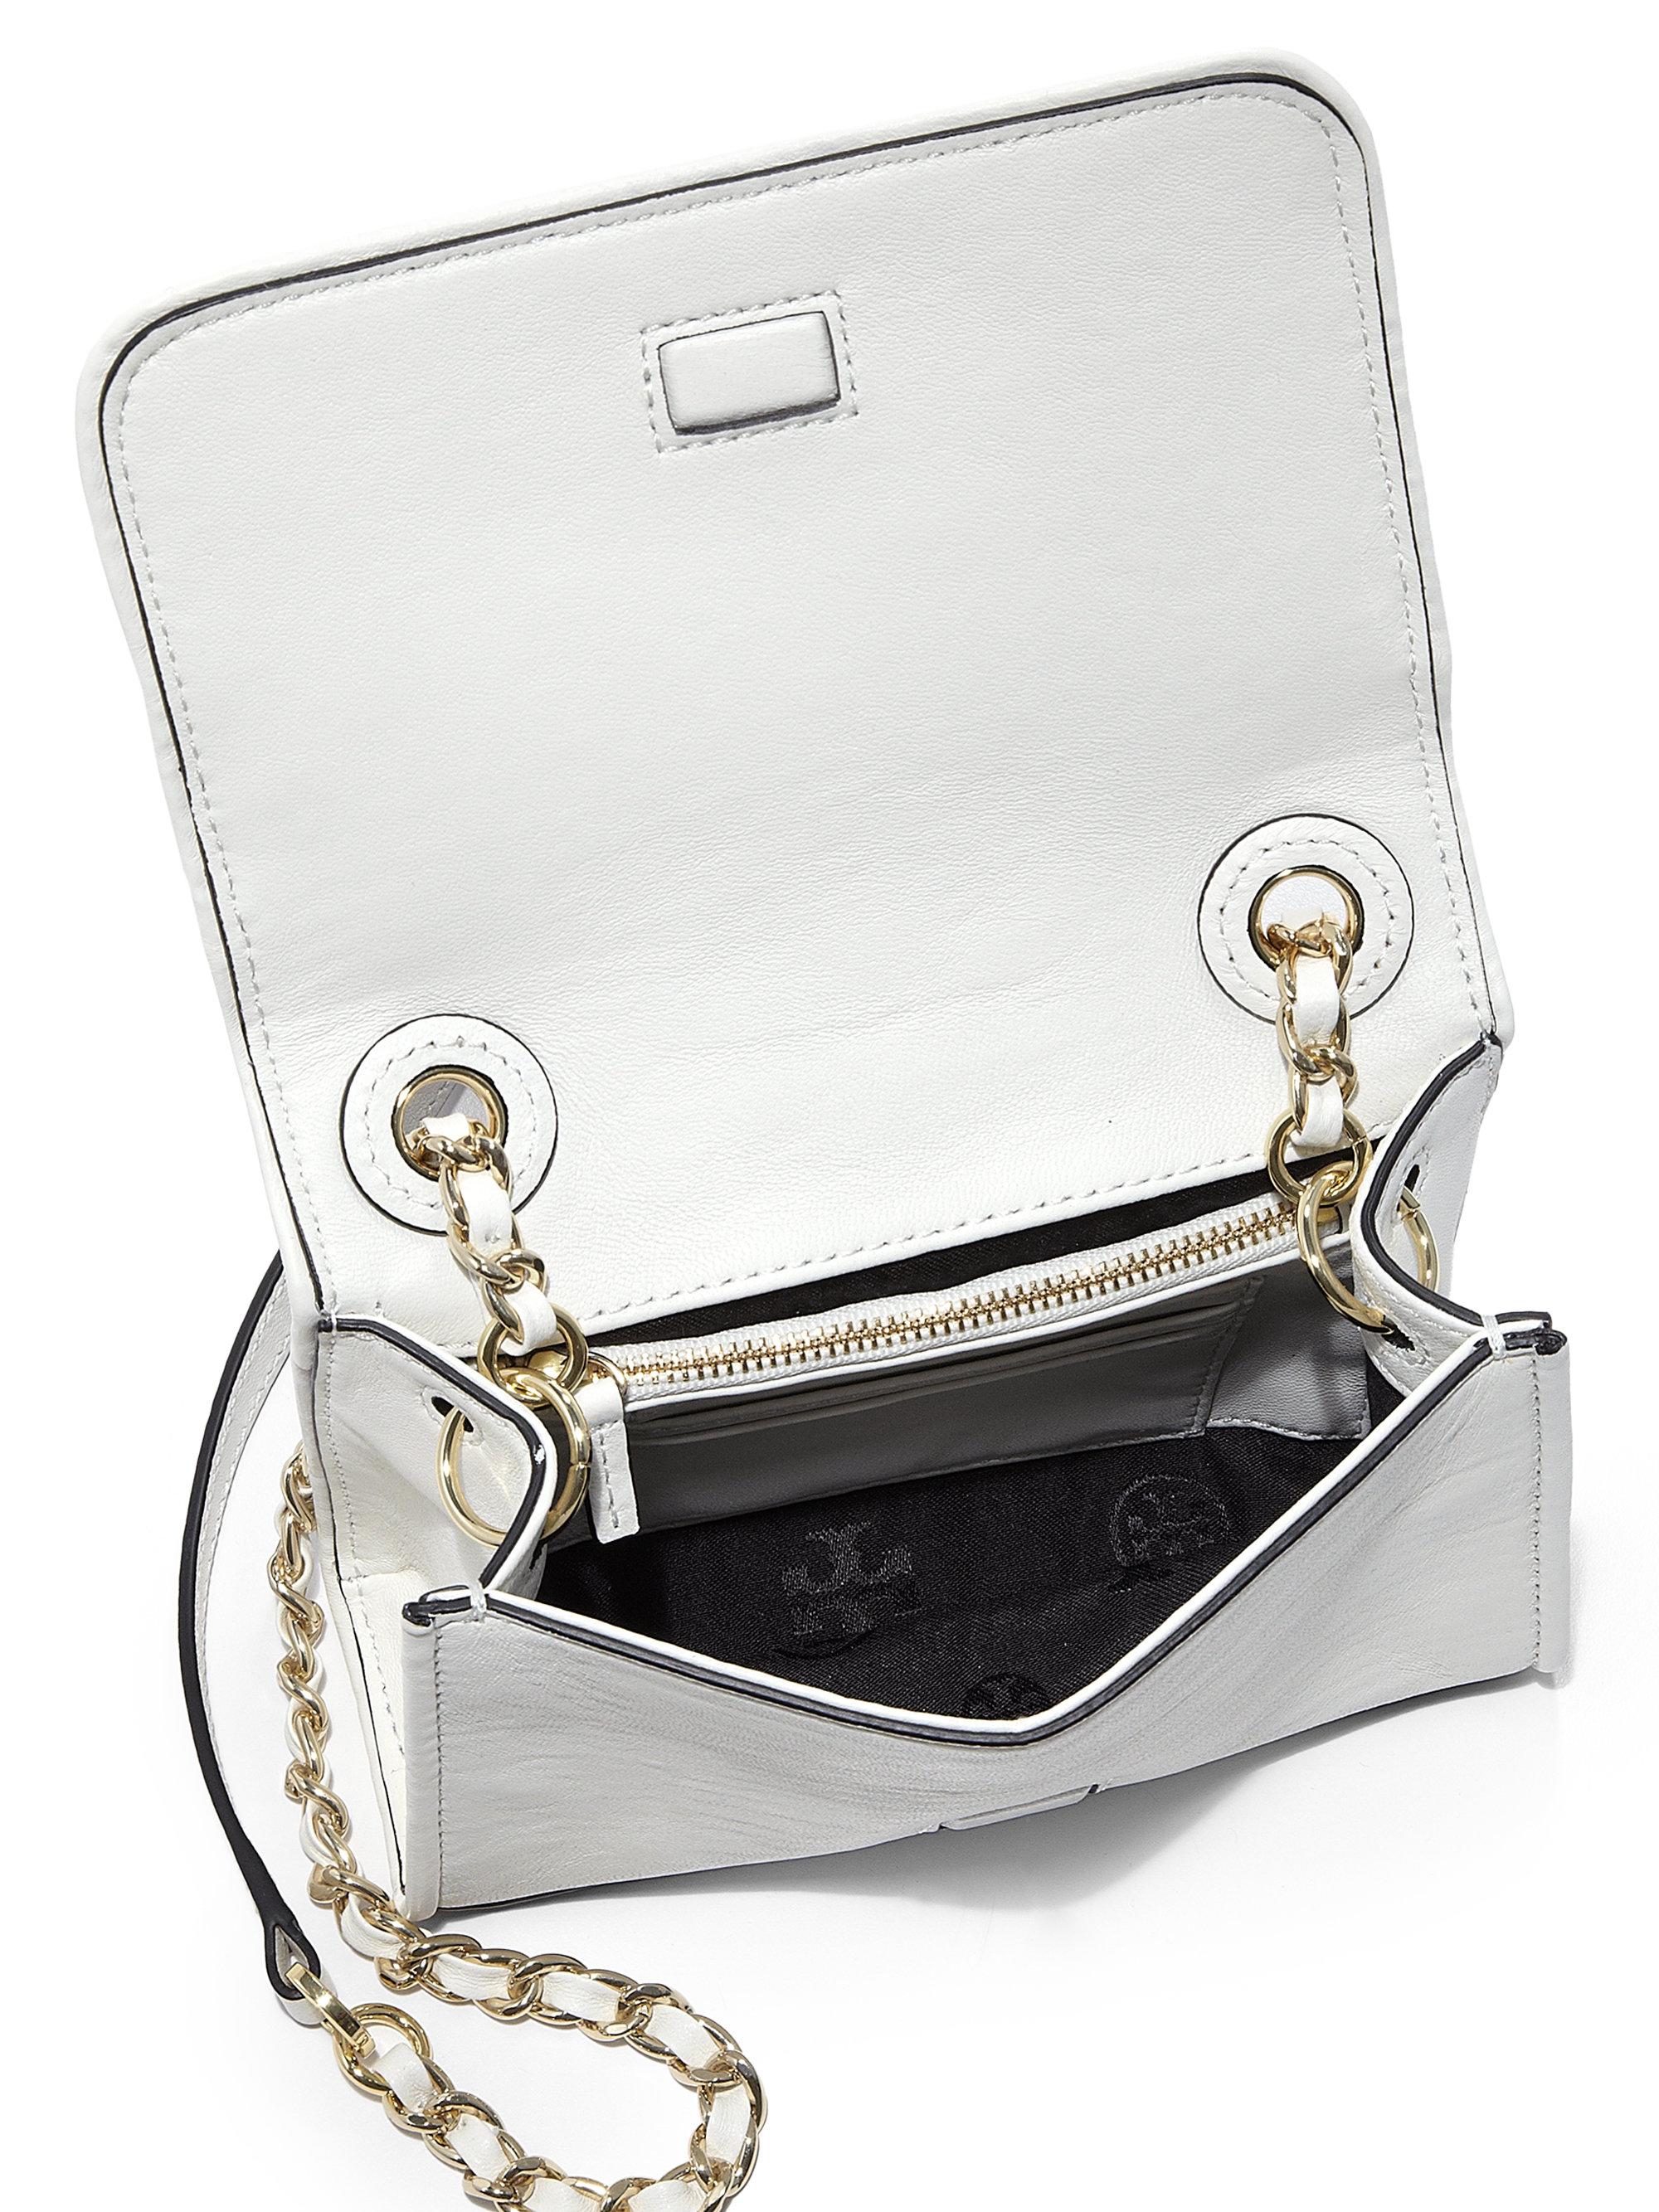 c8a8371027a4 Lyst - Tory Burch Fleming Mini Crossbody Bag in White